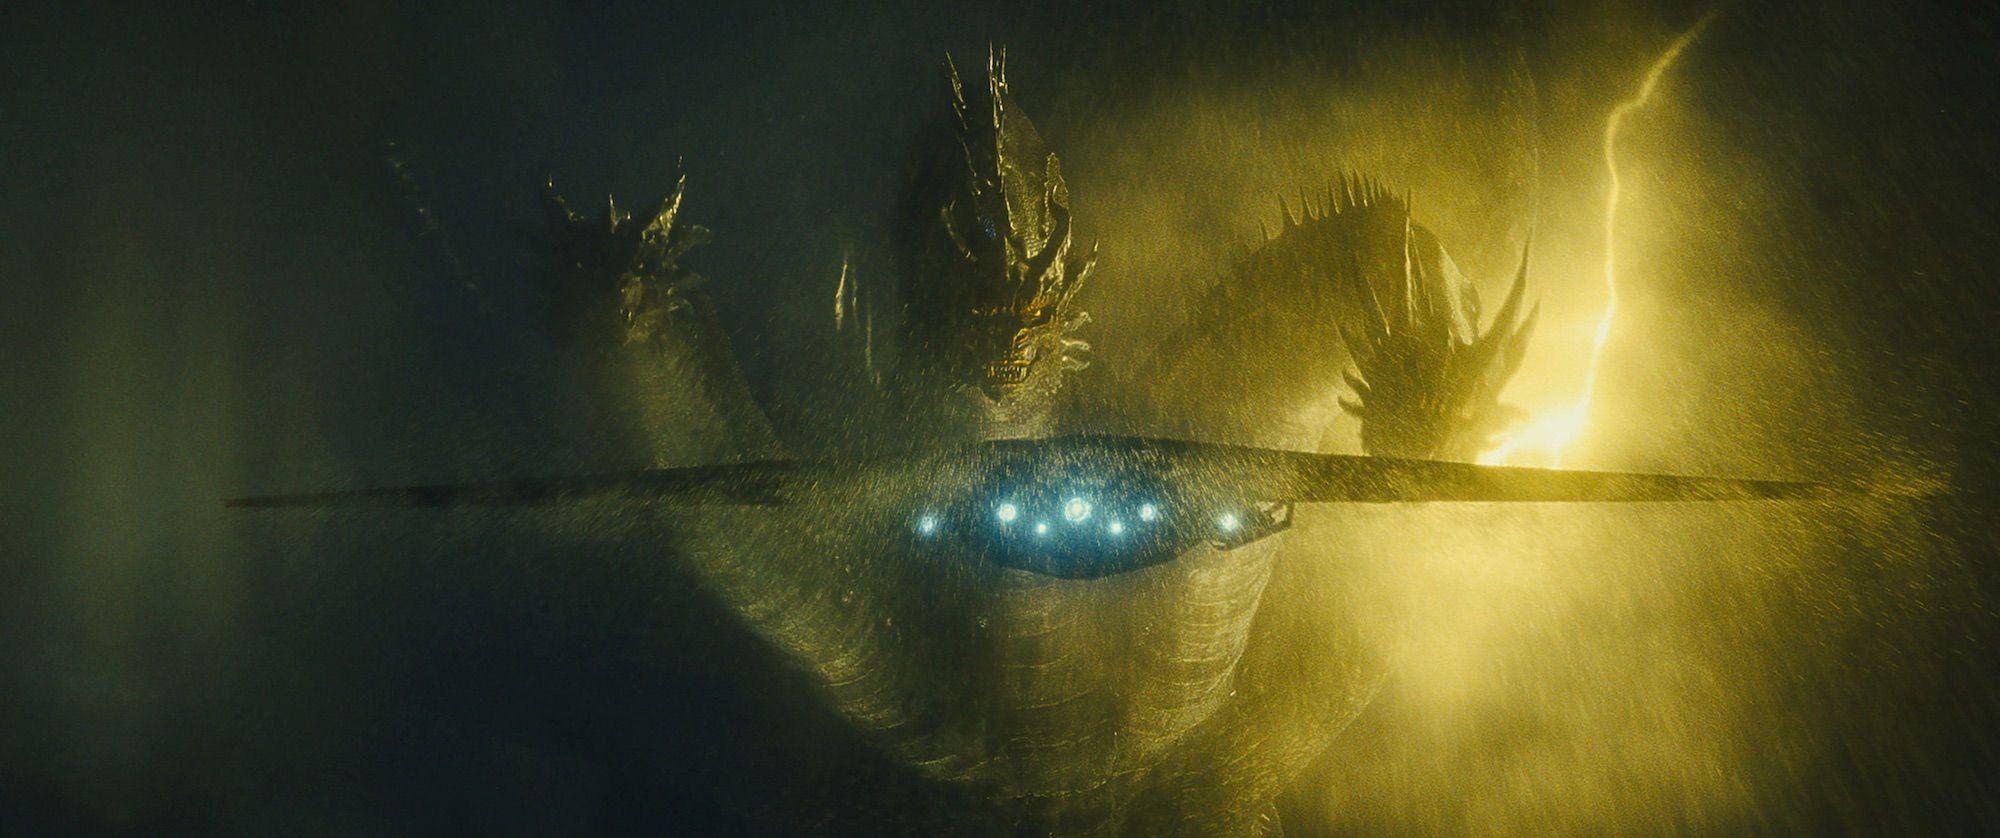 Godzilla-King-of-the-Monsters-Ghidorah-1